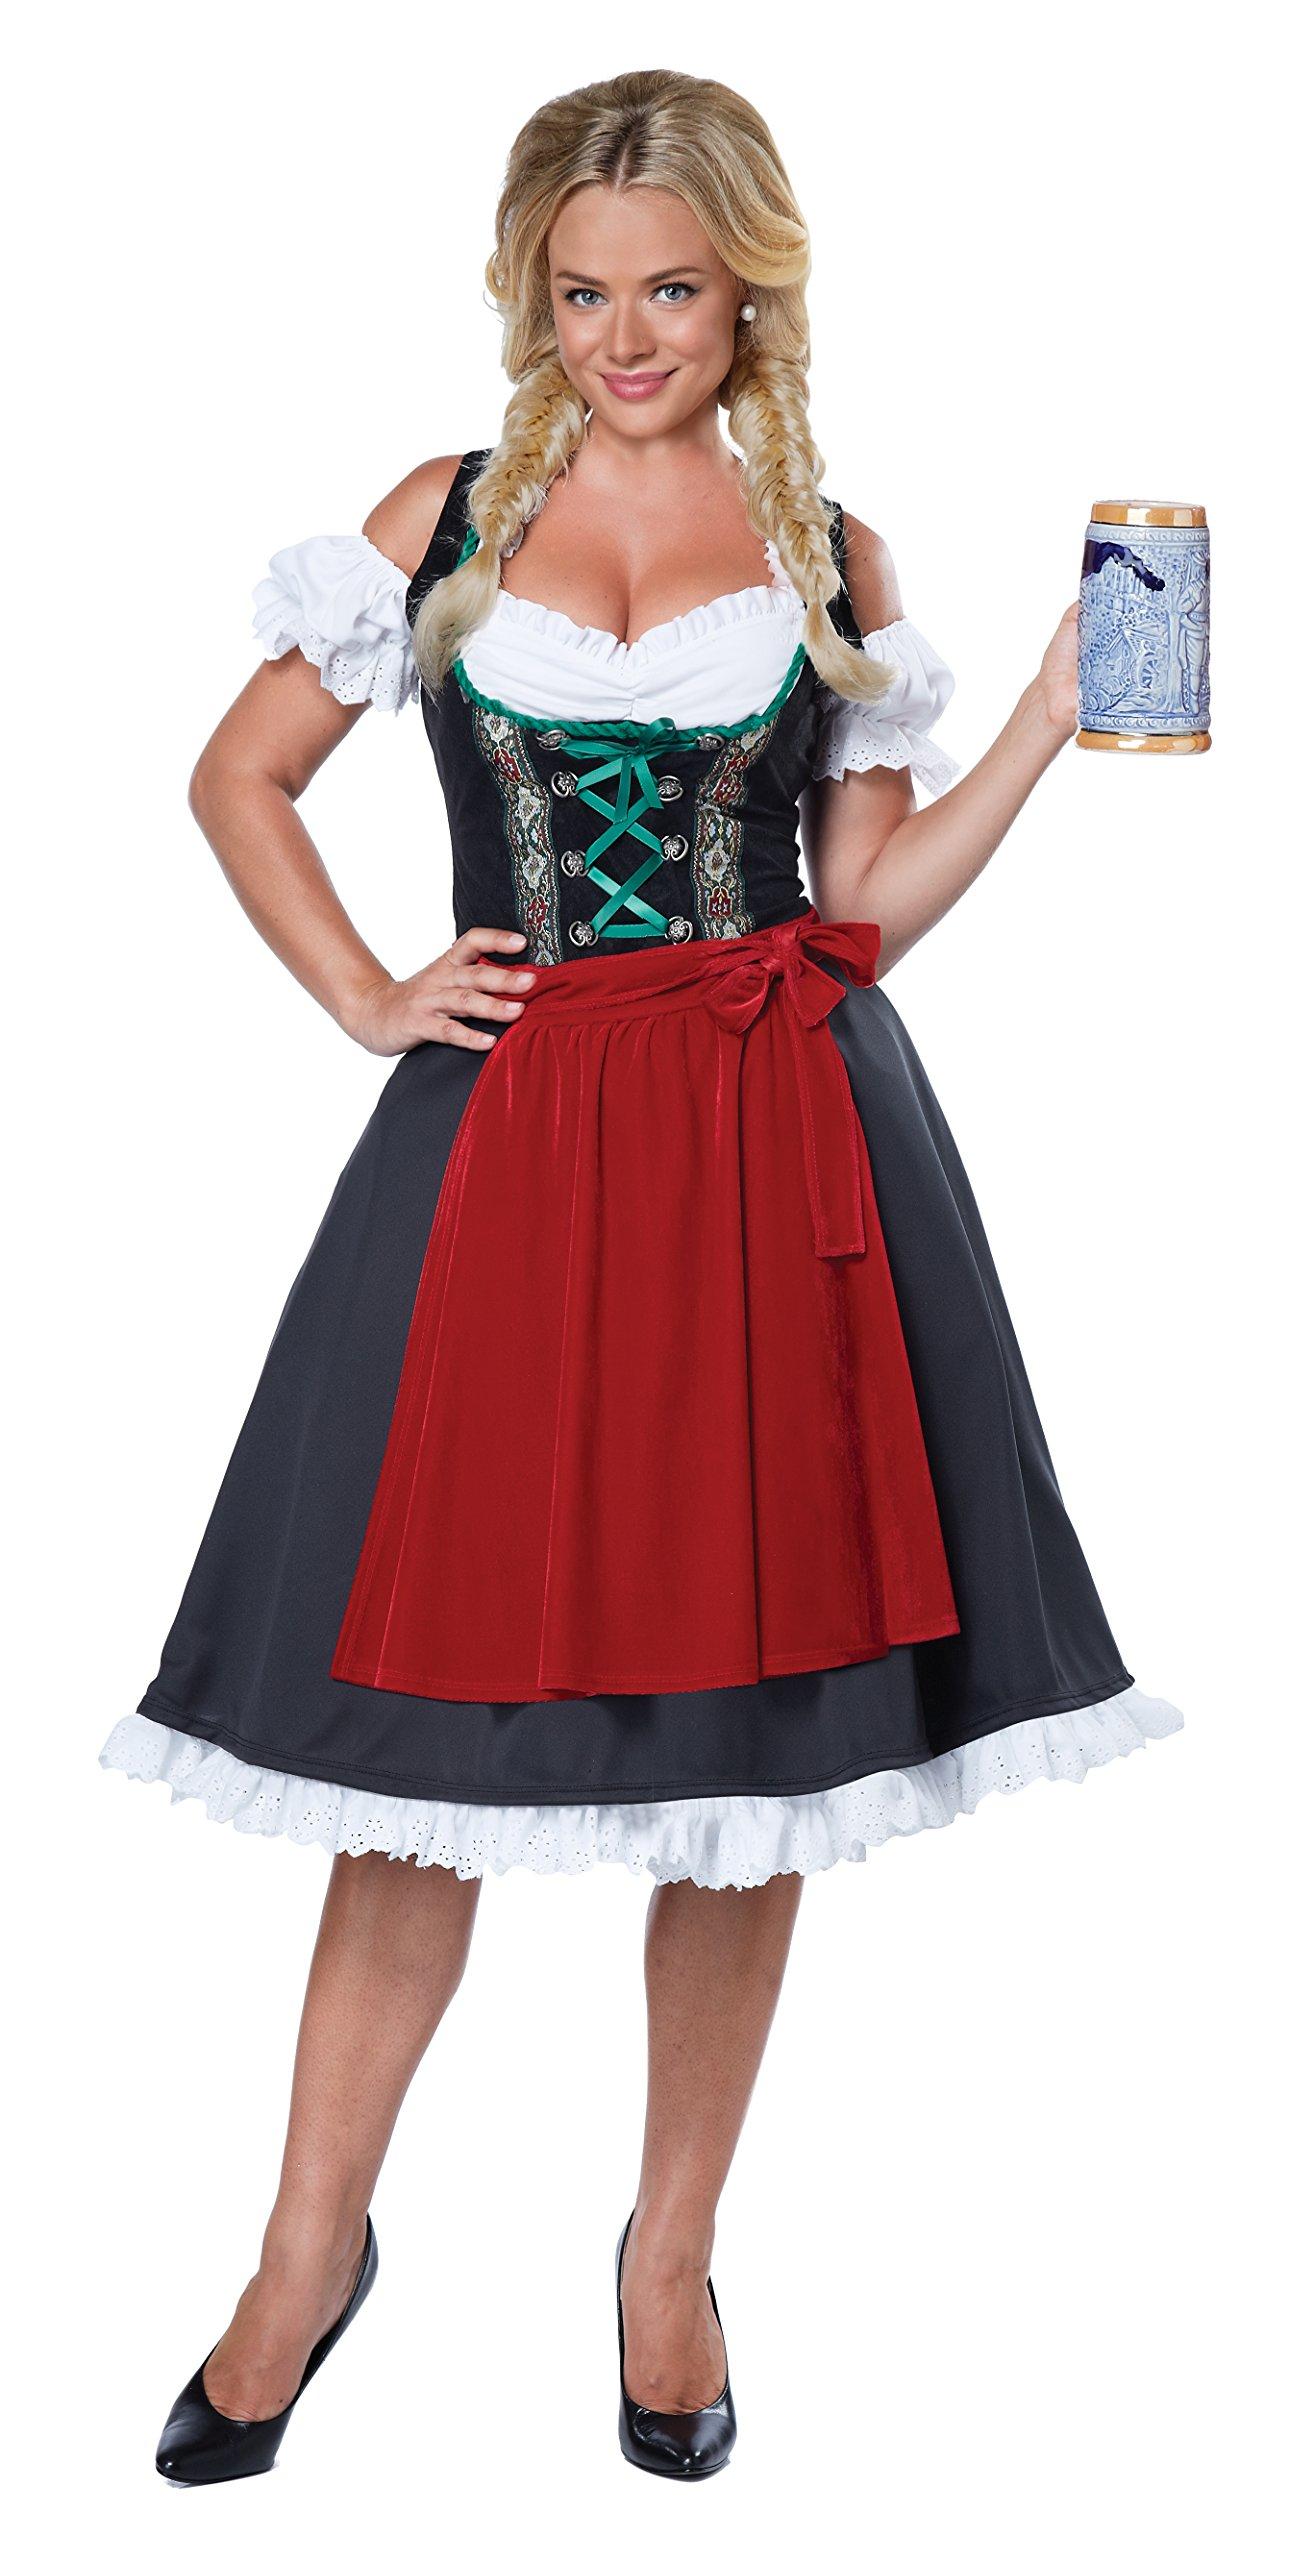 California Costumes Women's Oktoberfest Fraulein Costume, Black/Red, X-Large